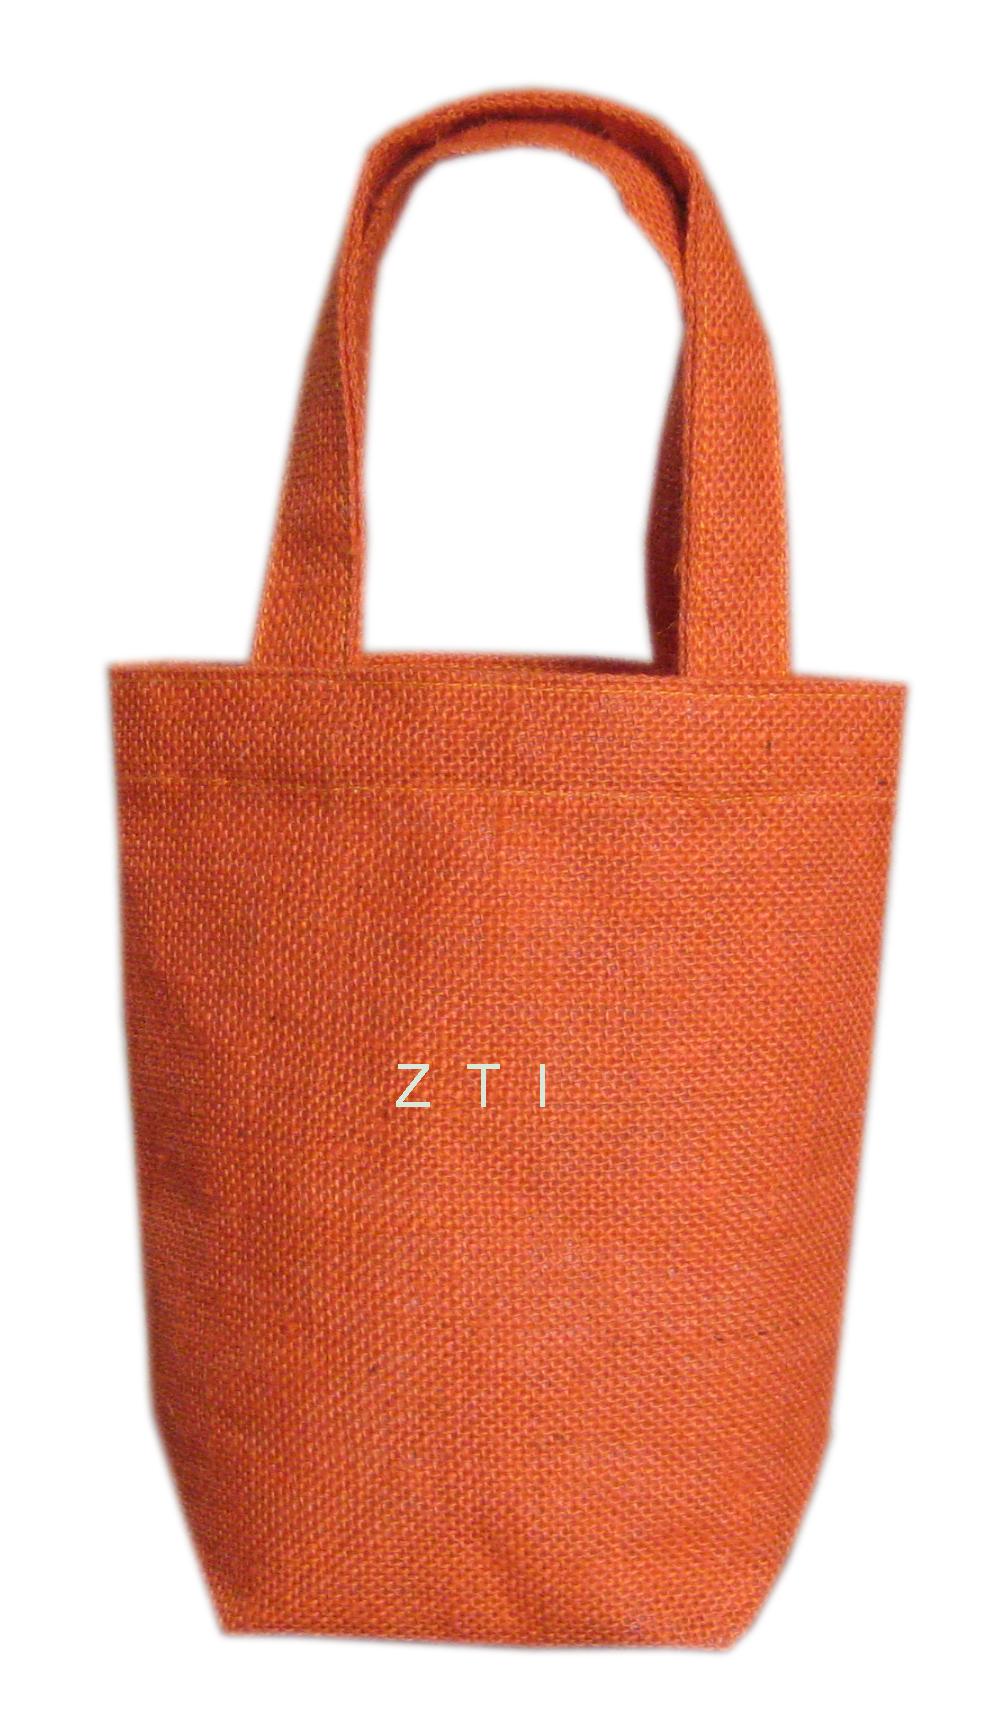 MODEL-NO.-1173-SIZE-20×20-10cms.-PRICE-US-0.55